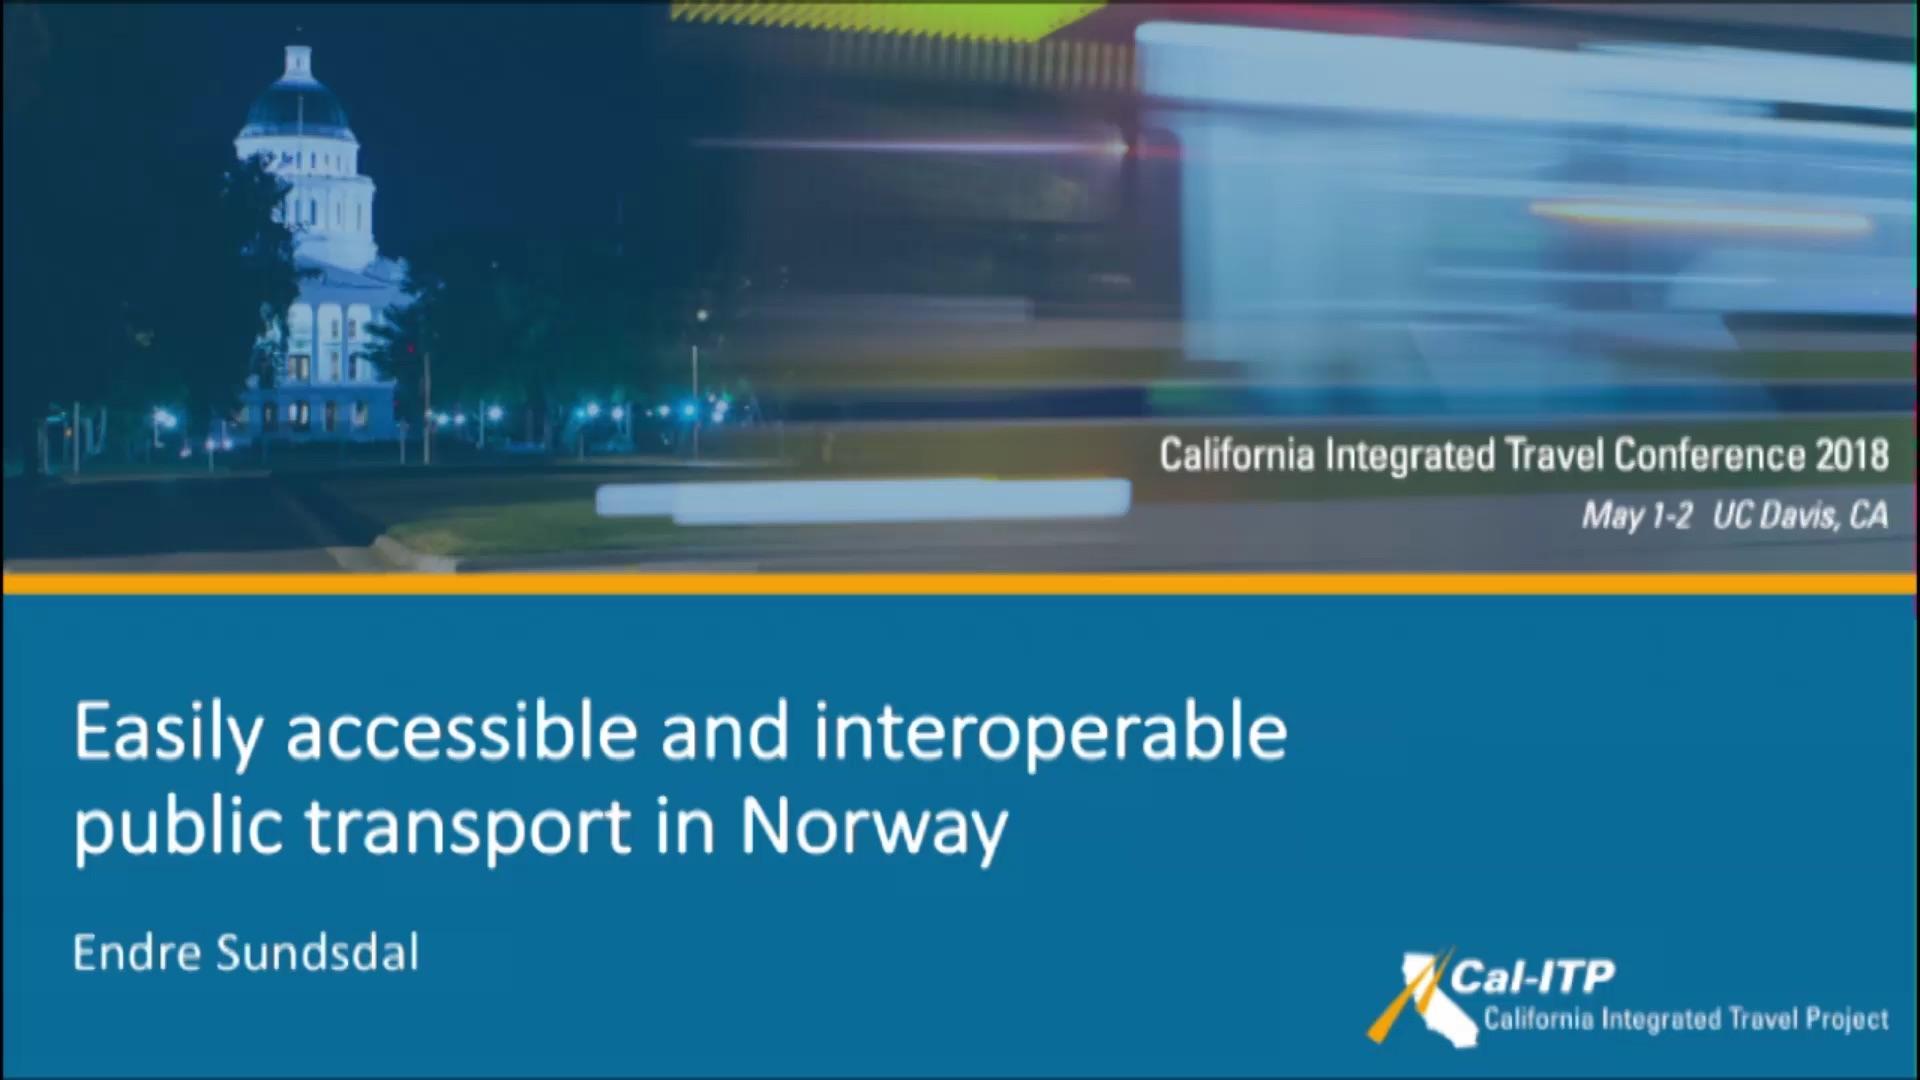 13. Interoperable Public Transport in Norway